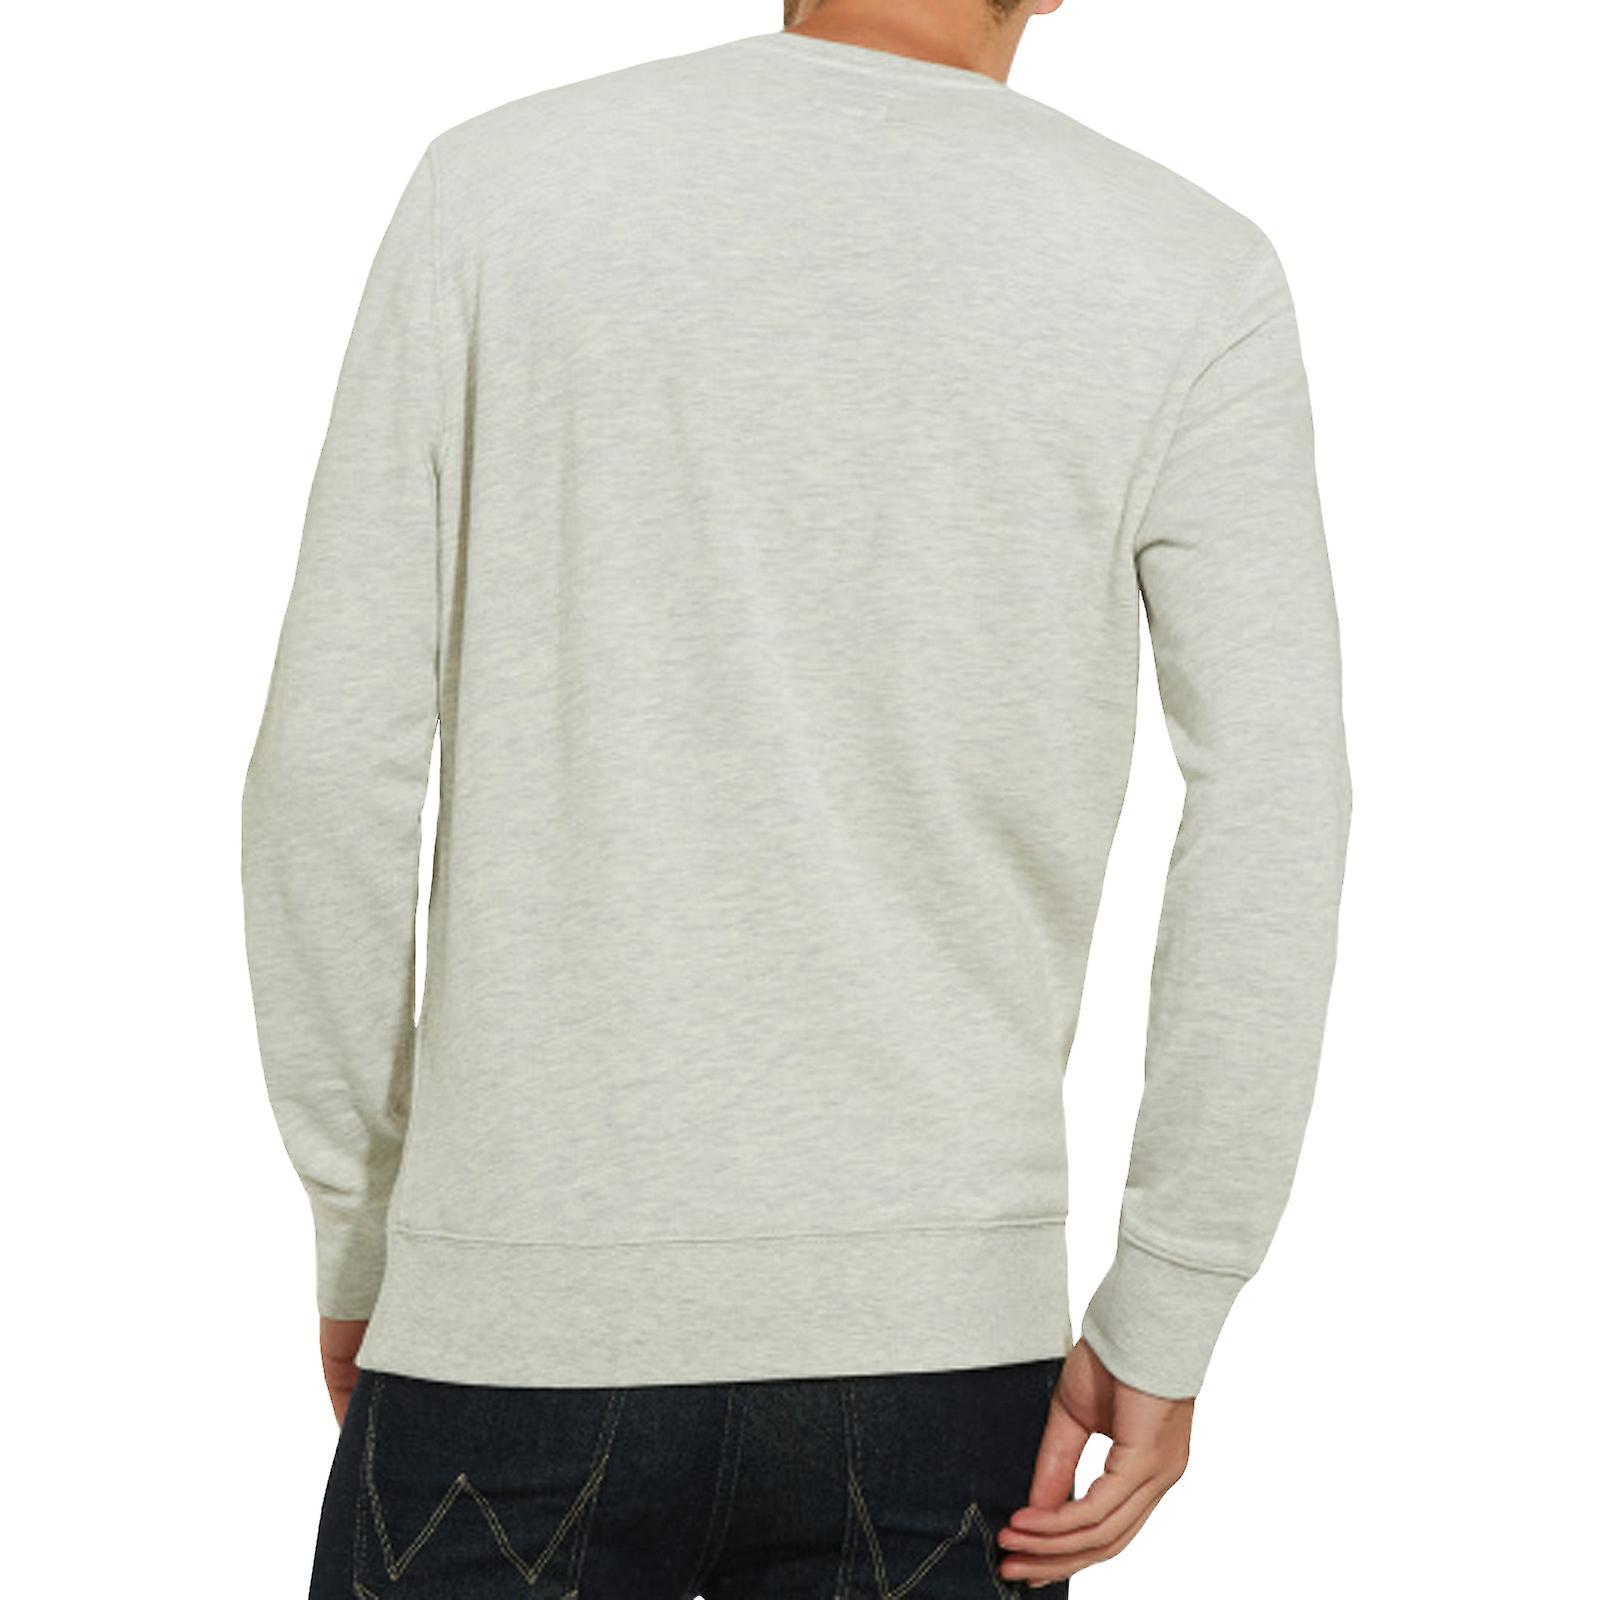 Wrangler Mens Mascotte Long Sleeve Crew Neck Pullover Sweatshirt Sweater